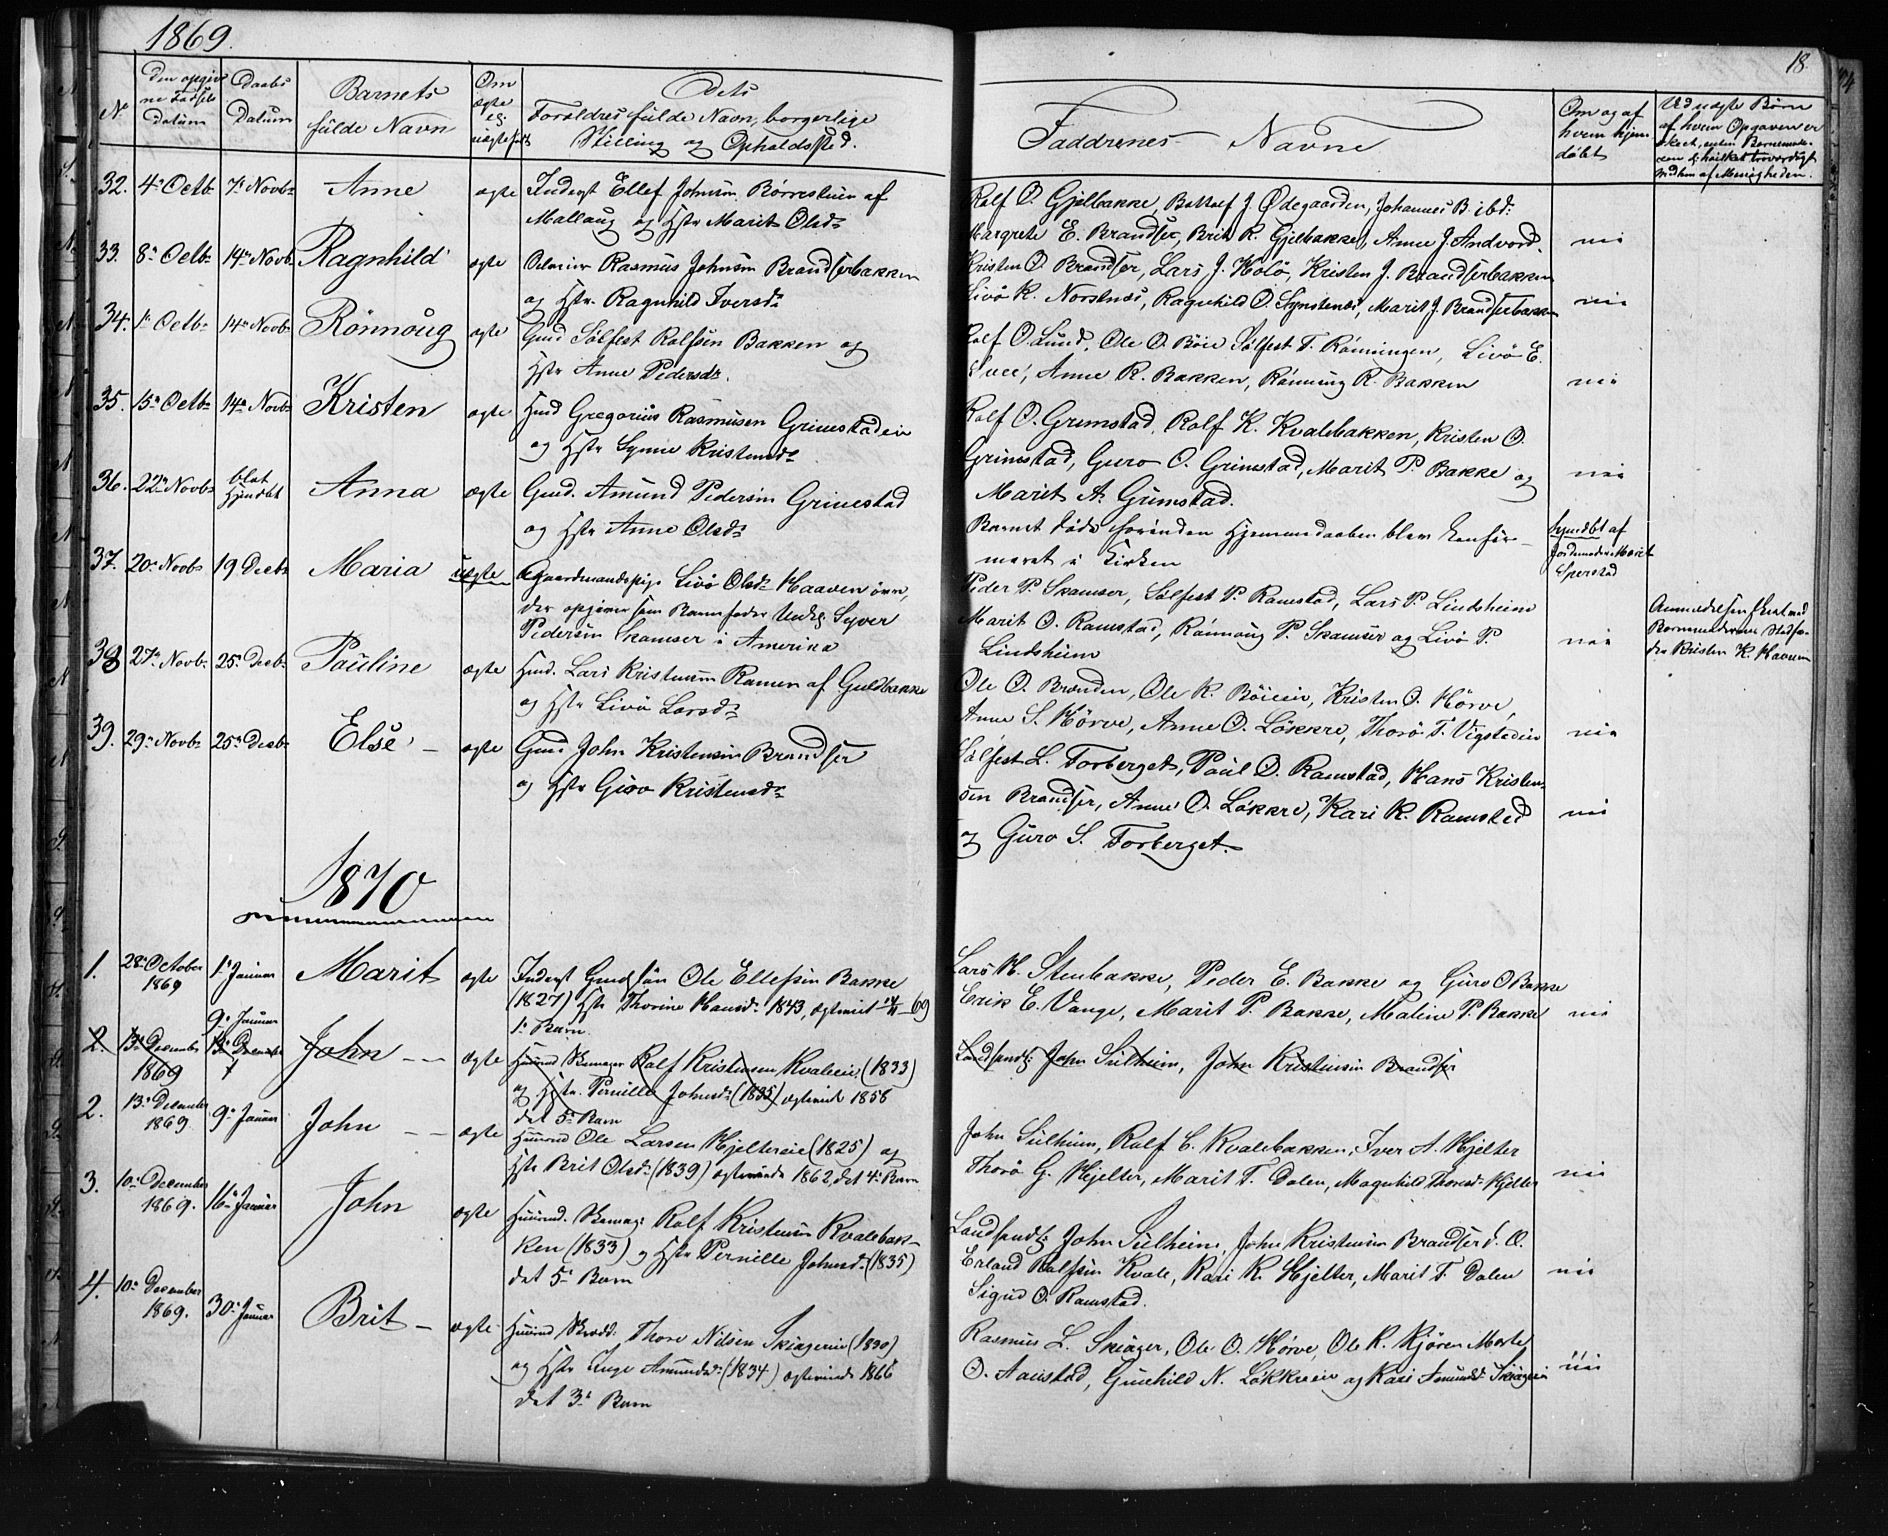 SAH, Skjåk prestekontor, Klokkerbok nr. 1, 1865-1893, s. 18